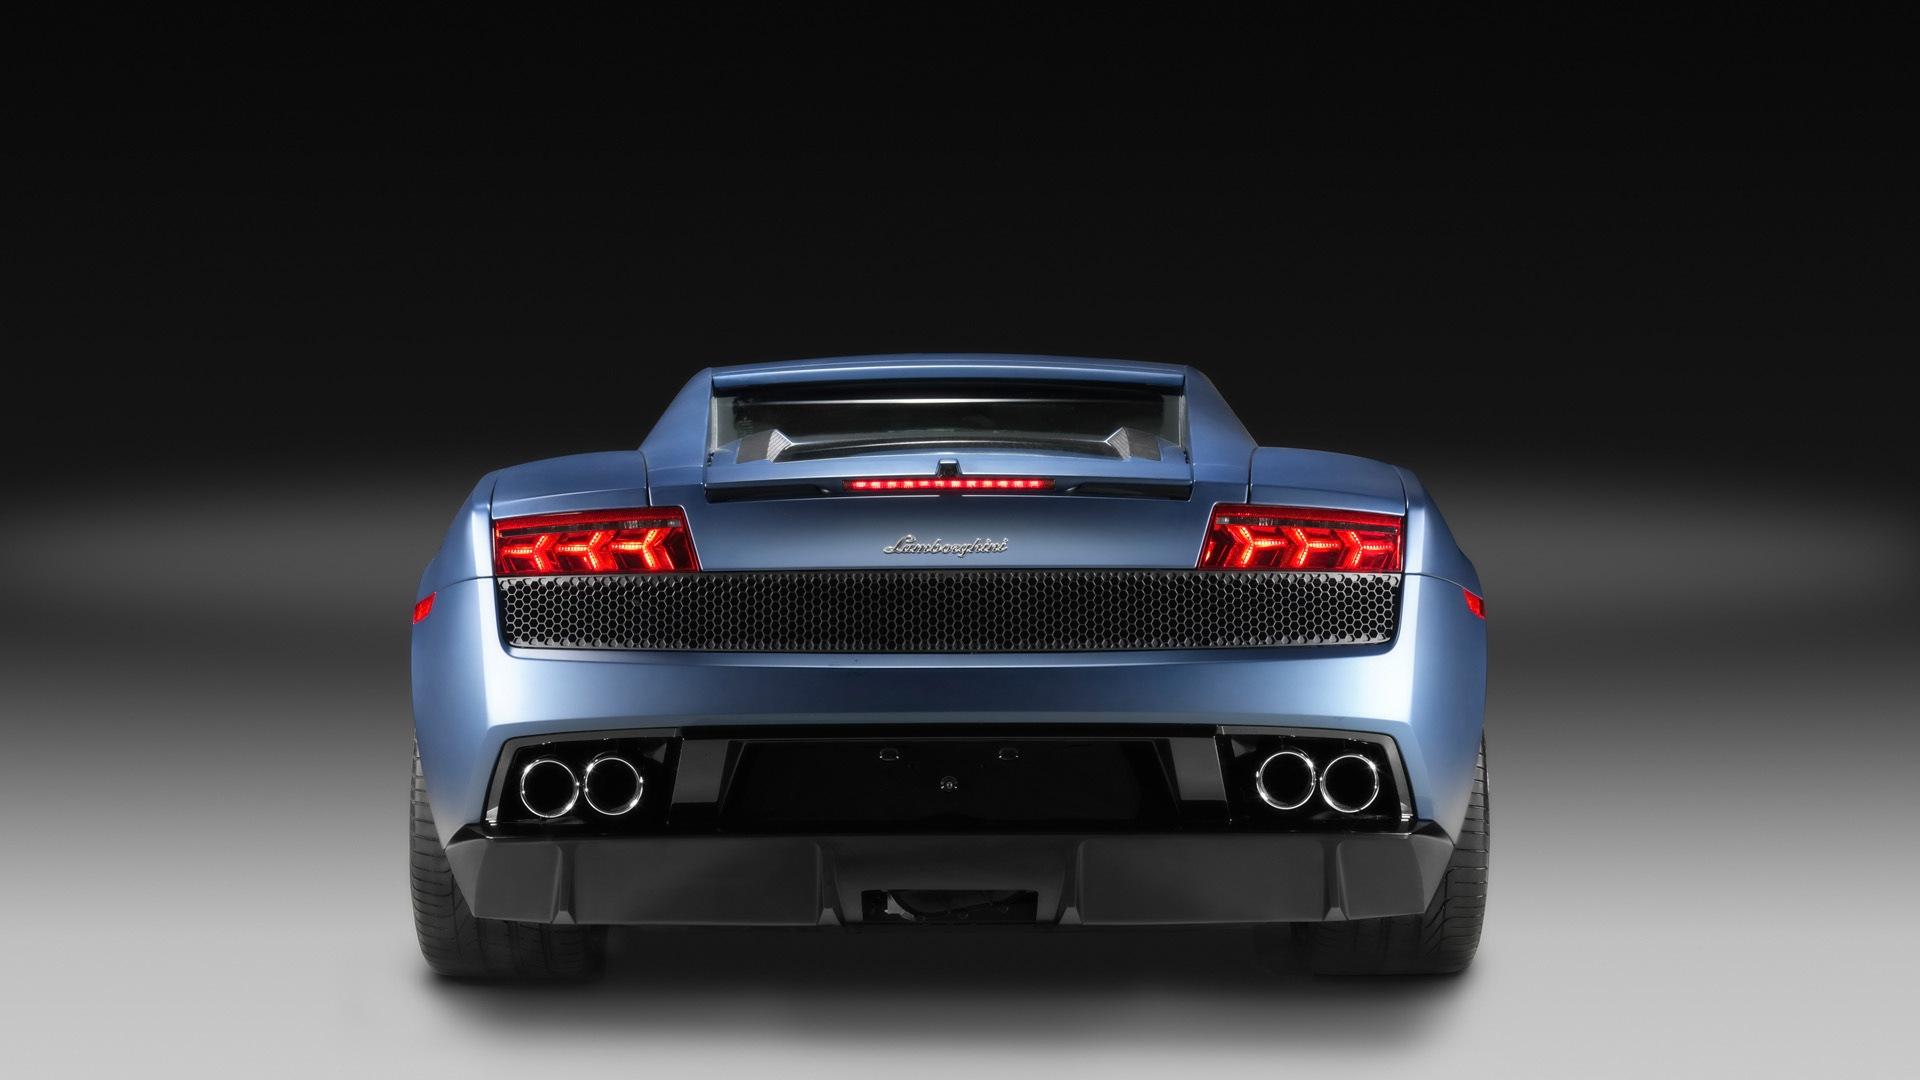 Lamborghini Gallardo Backlight Google Covers Google Plus Covers Photos